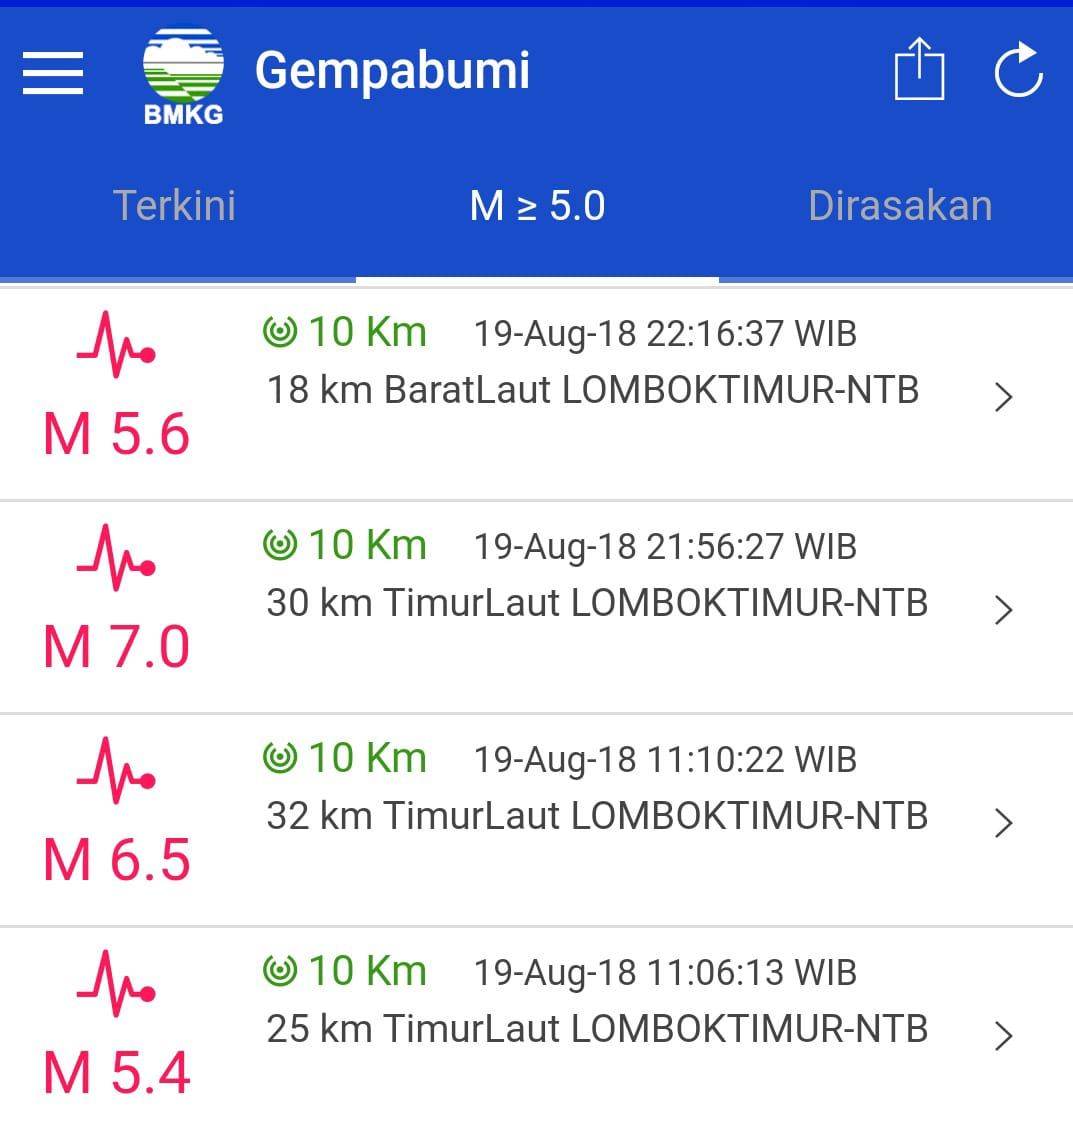 Innalillahi, Gempa 7,0 Magnitudo Kembali Guncang Lombok